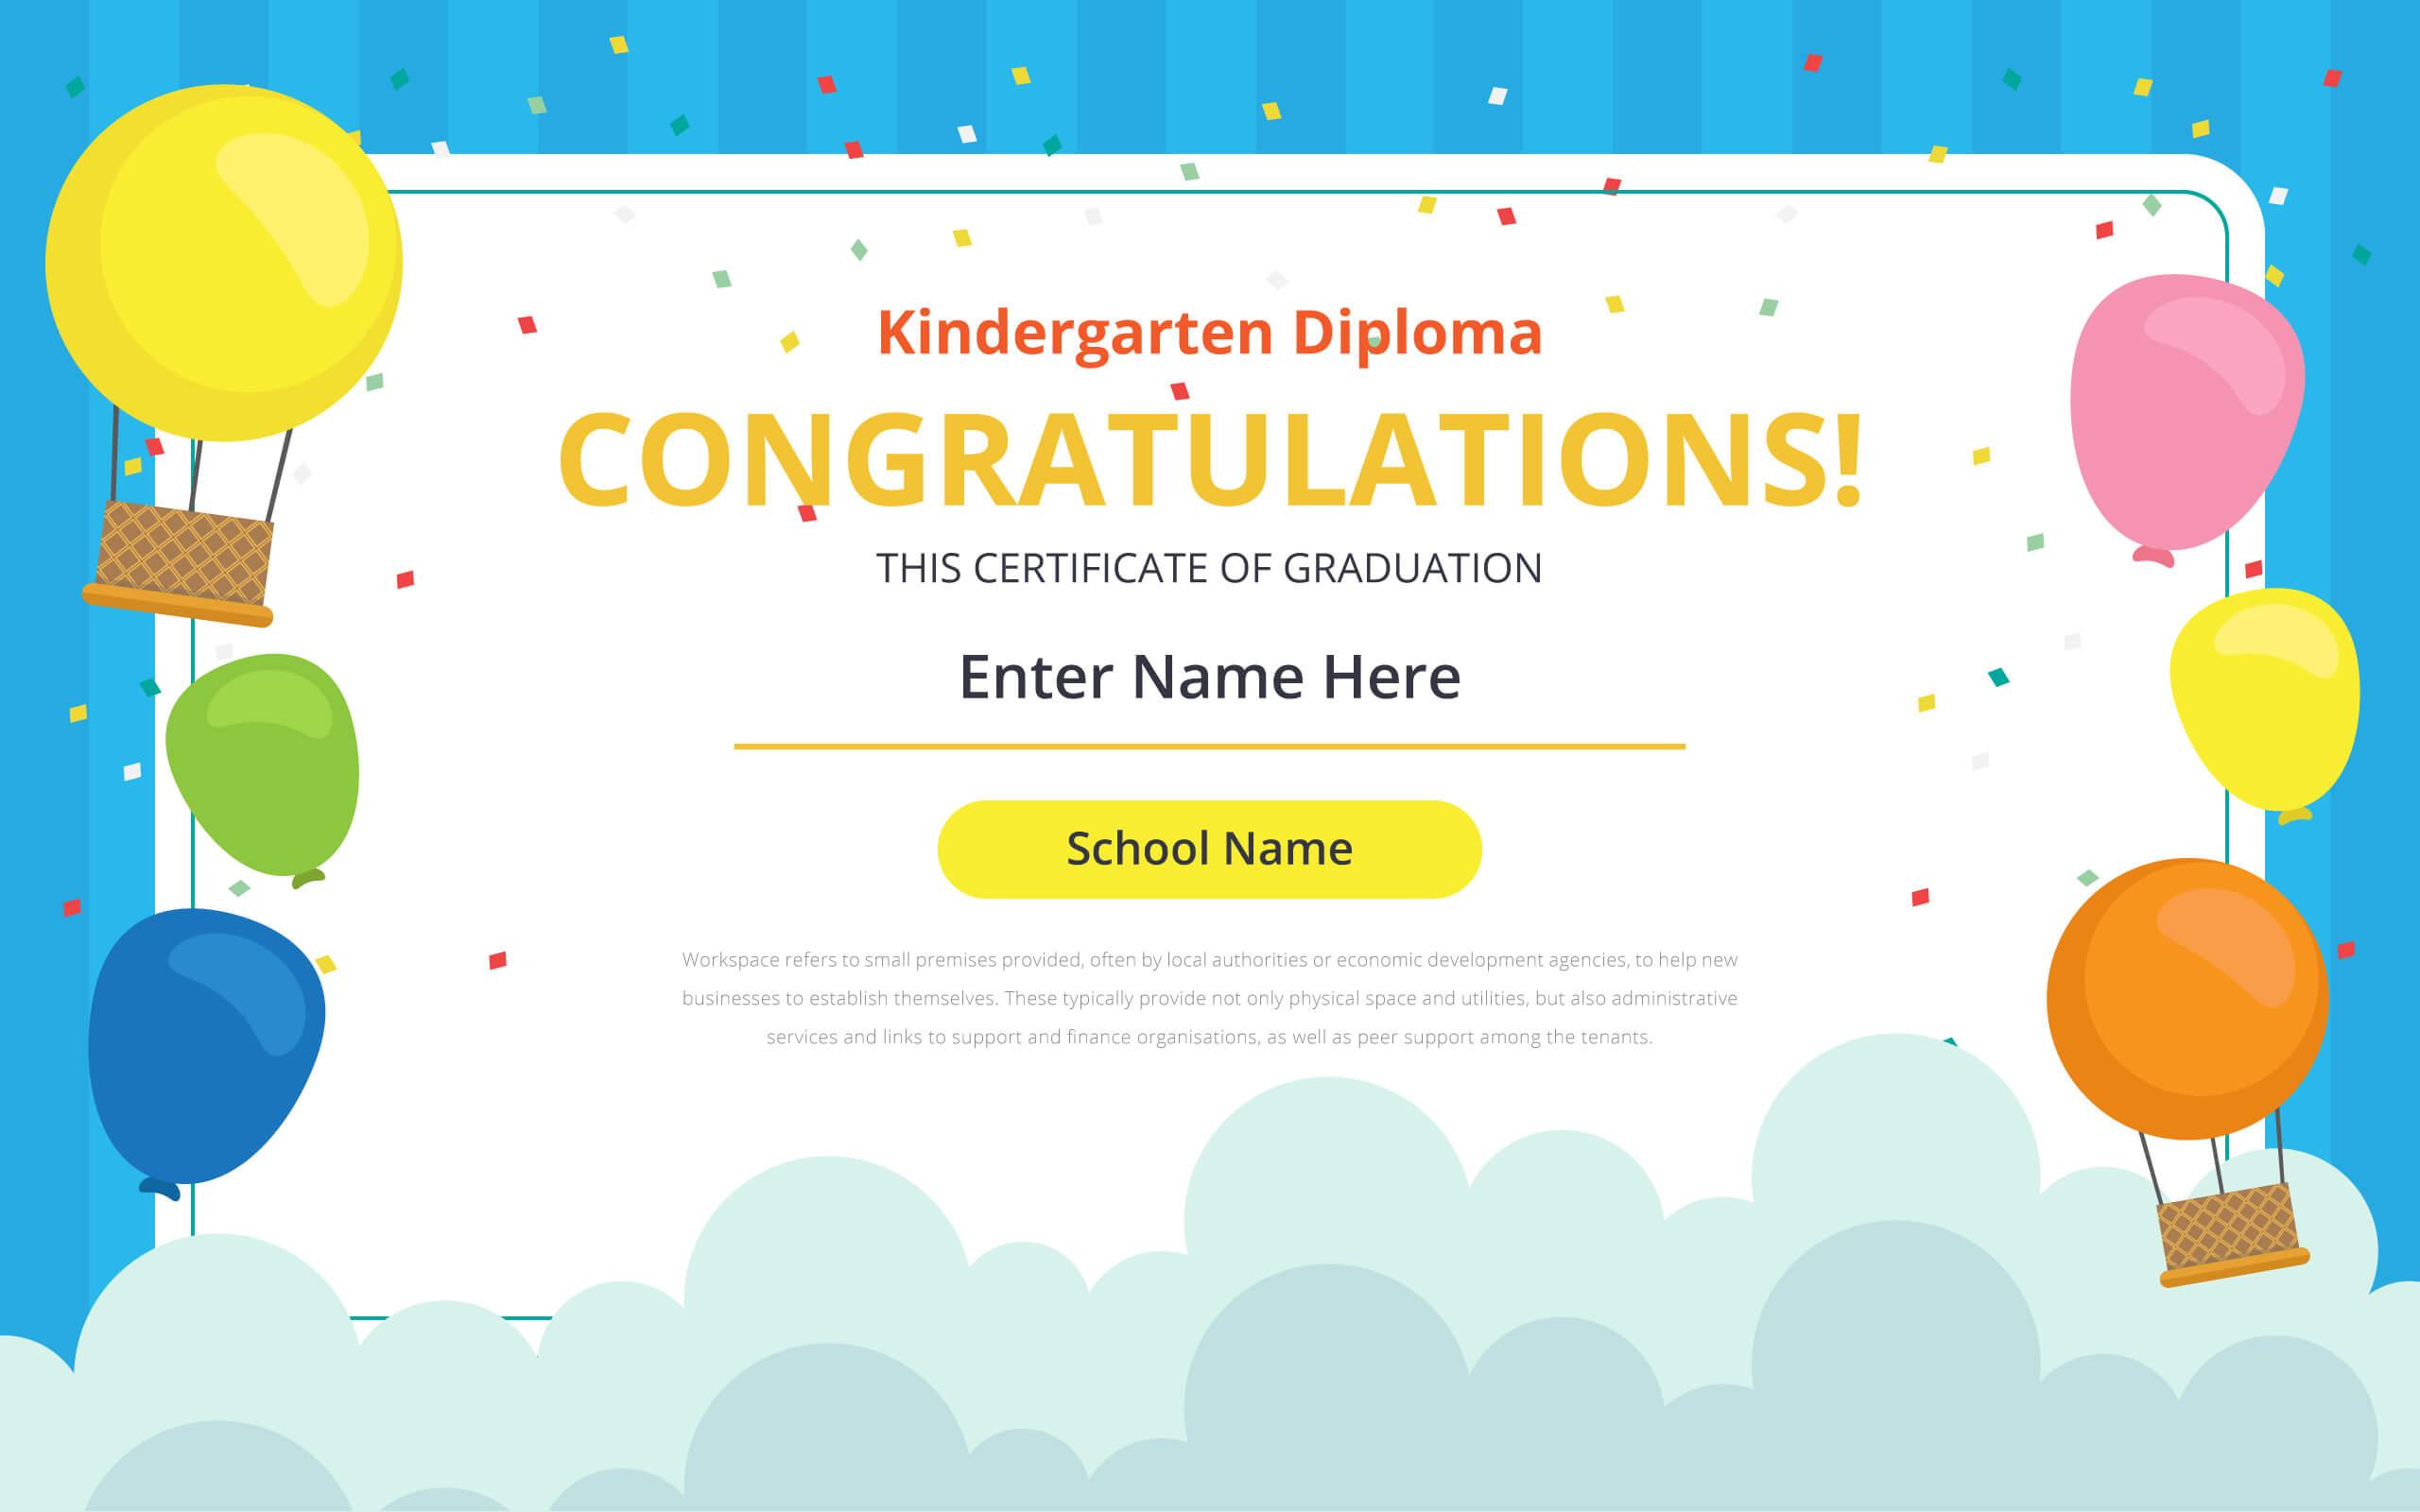 Kindergarten Certificate Free Vector Art – (21 Free Downloads) Throughout Certificate Templates For School